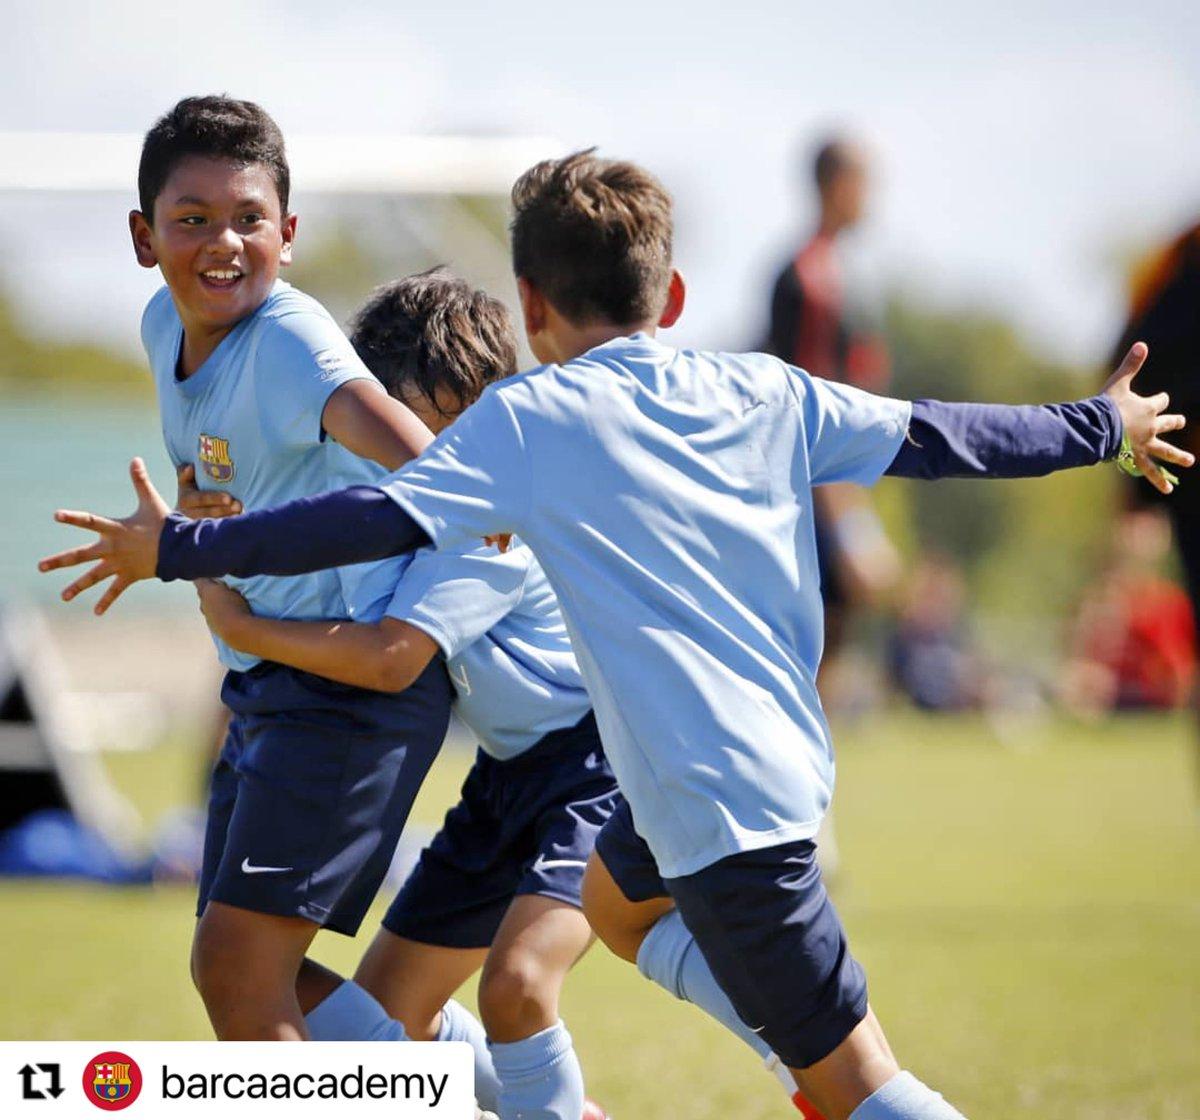 #Repost @barcaacademy with @make_repost ・・・ 💙❤ ¡Feliz día mundial del abrazo! #DiaInternacionalDelAbrazo #AbrazoDeGol  . 💙❤ Happy Hug Day! We'll be back! #HugDay . #BarçaAcademy #BarcaAcademy #BarçaEscola #FCBEscola #FCB #FCBarcelona #Barça #Barca #Barcelona #Futbol